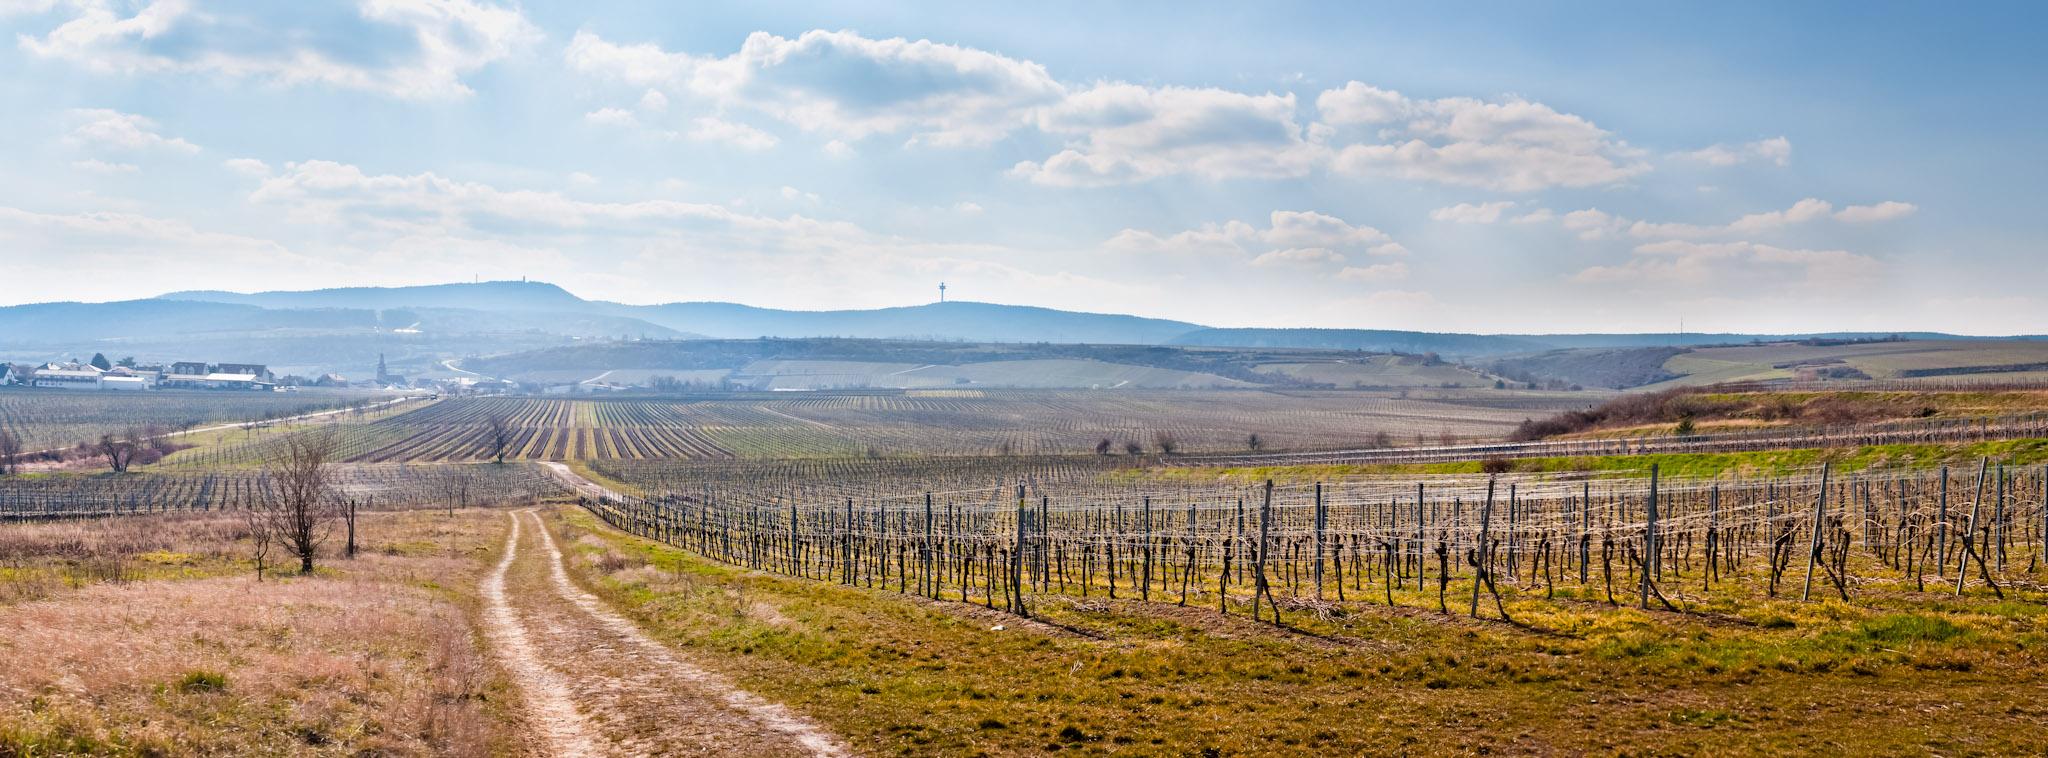 Bild: 20130407 Oschelskopf Panorama